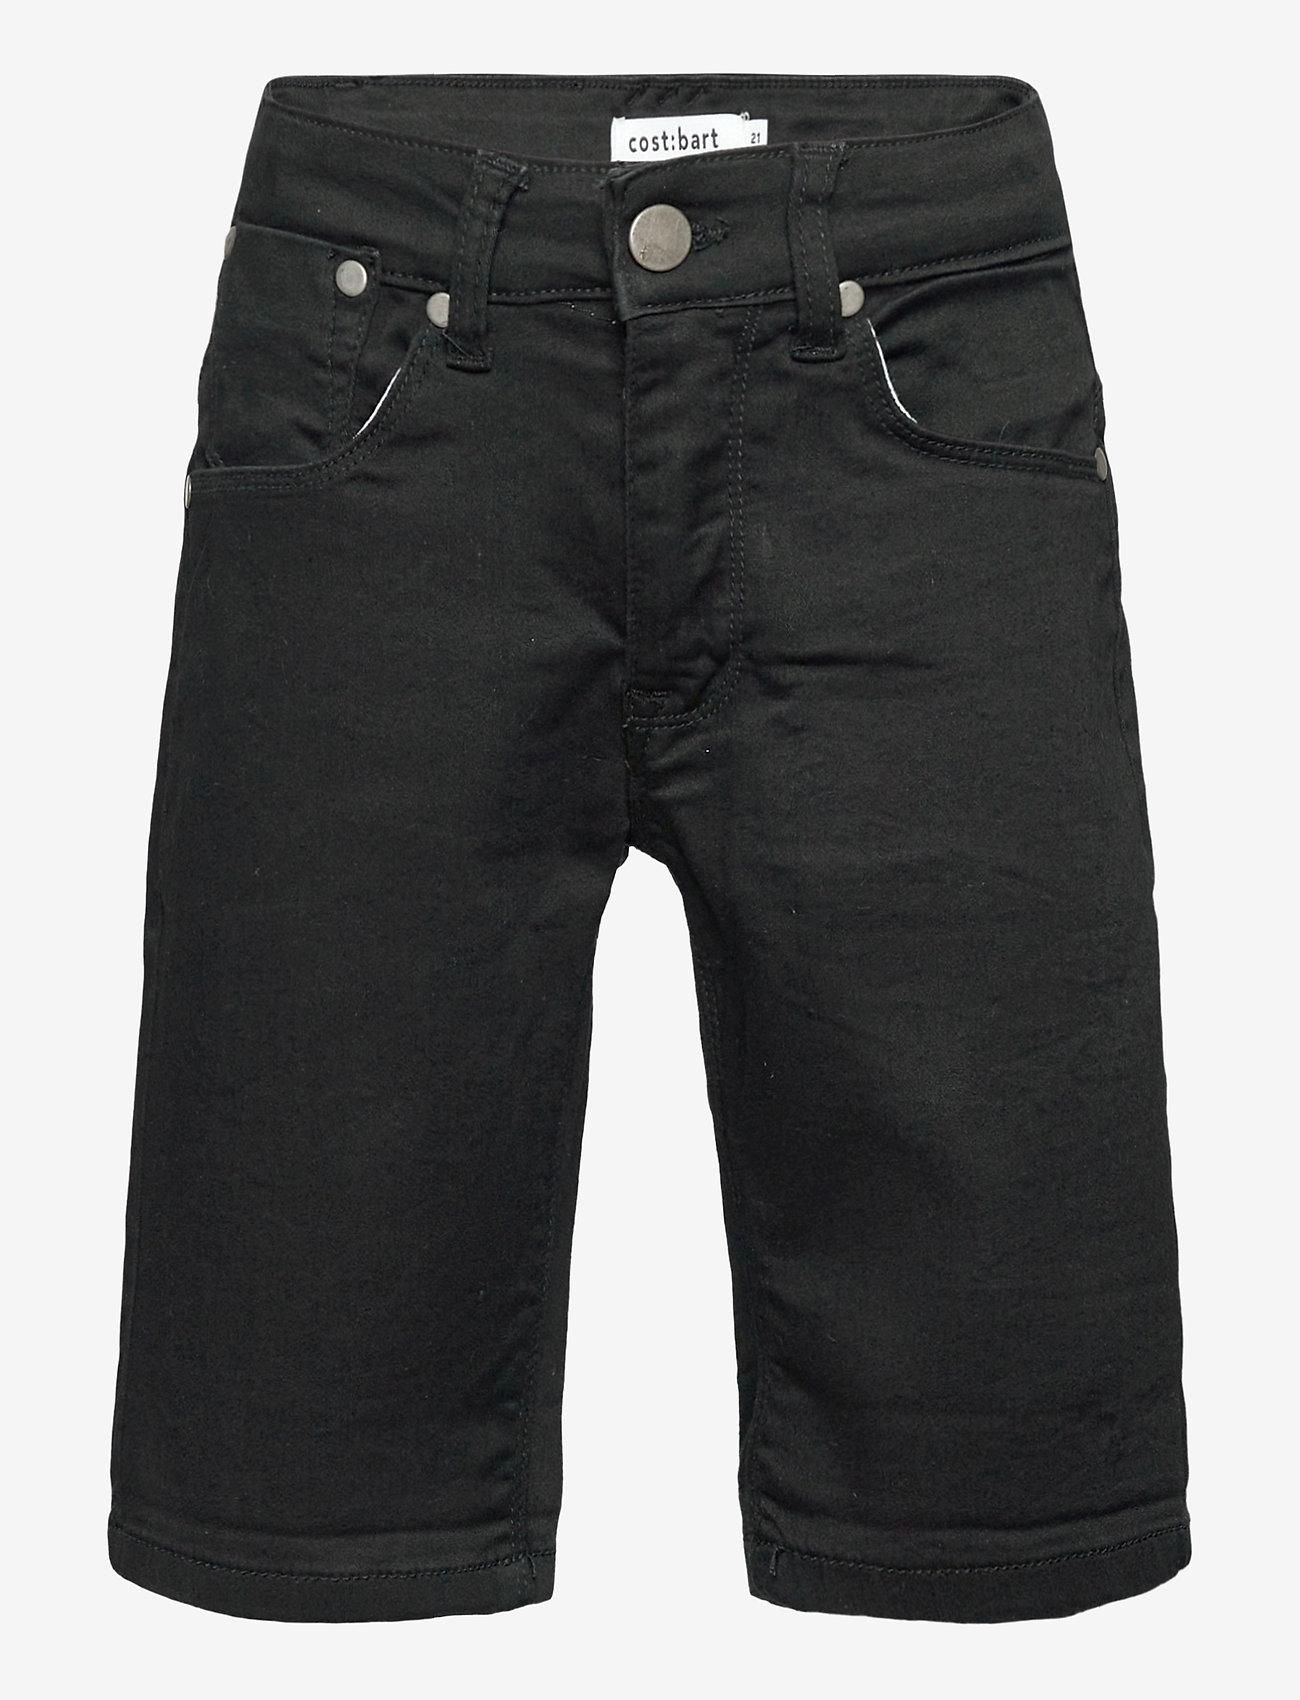 Costbart - SAM SHORTS BLACK WASH NOOS - shorts - black wash - 0